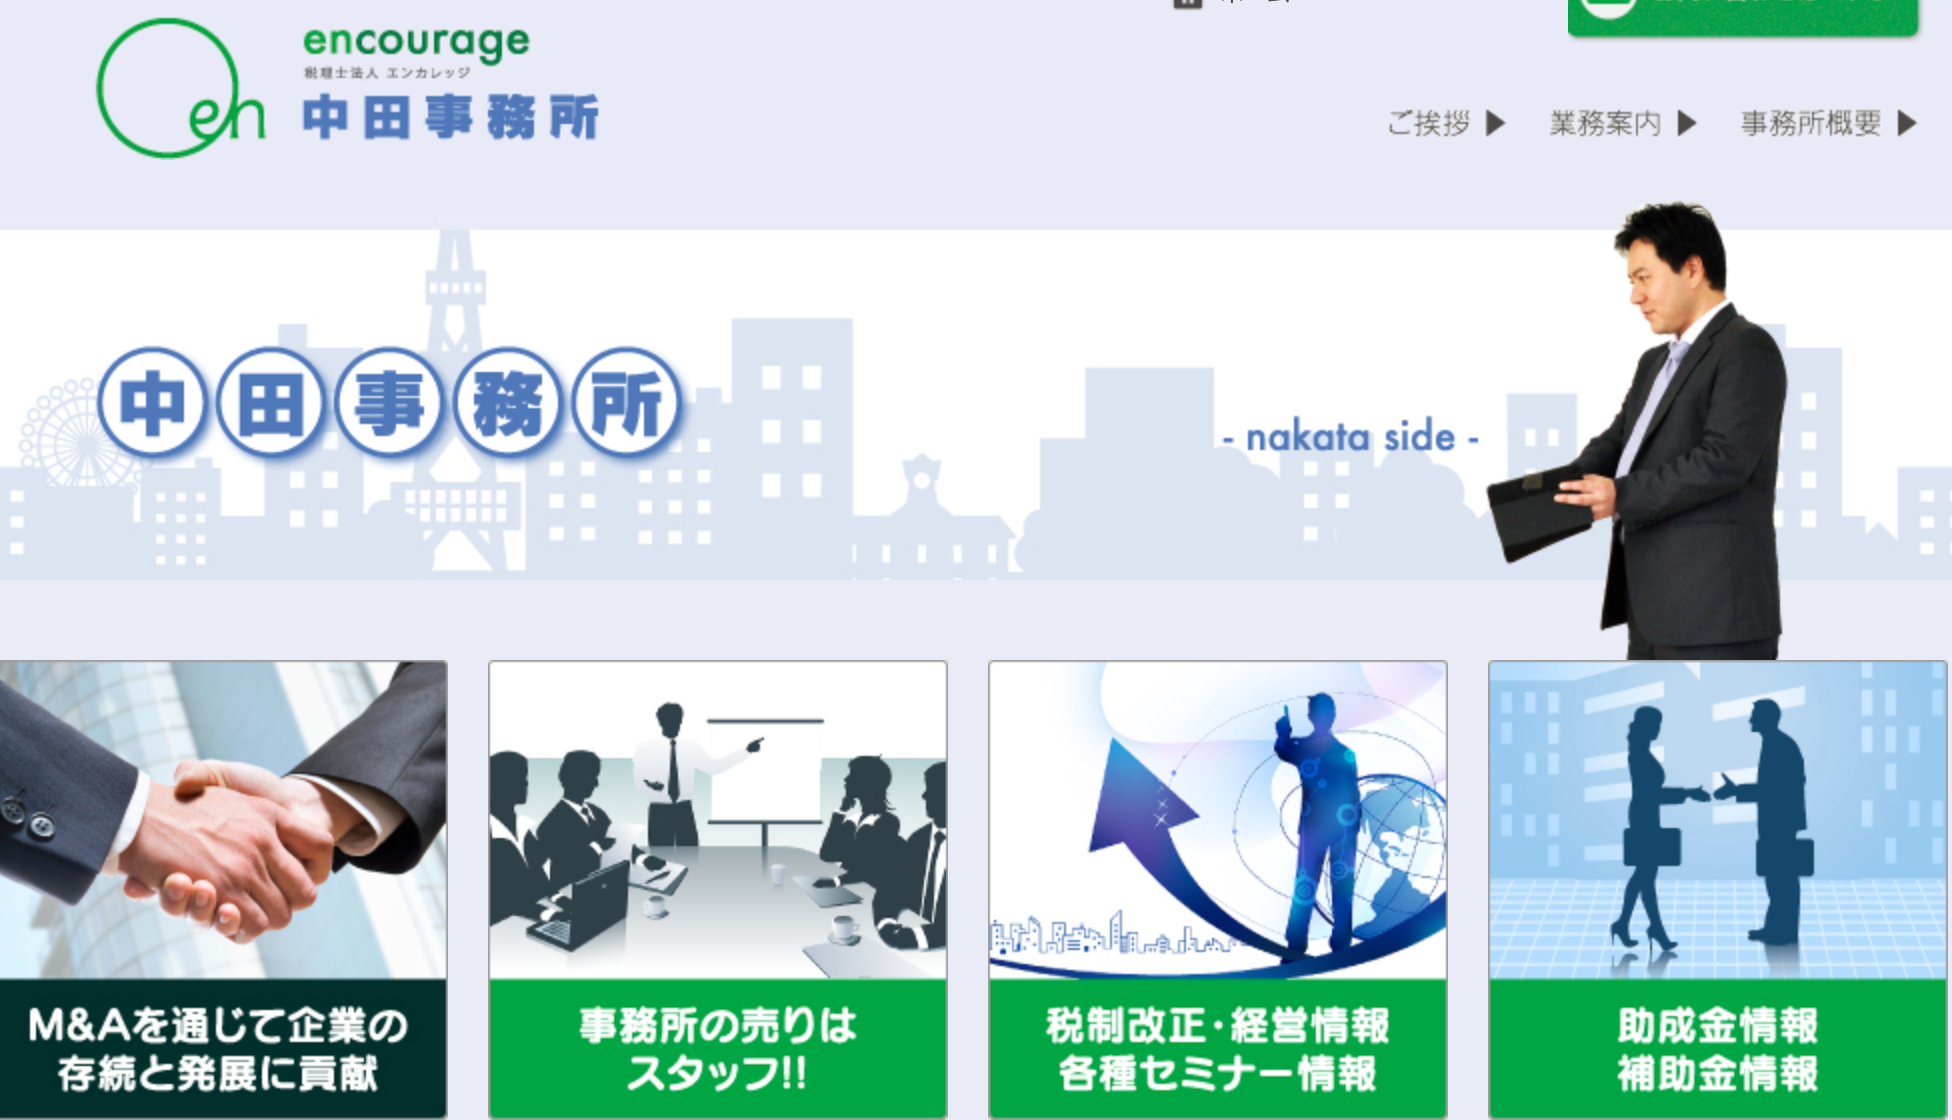 5.新札幌駅 徒歩15分 エンカレッジ(税理士法人)中田事務所